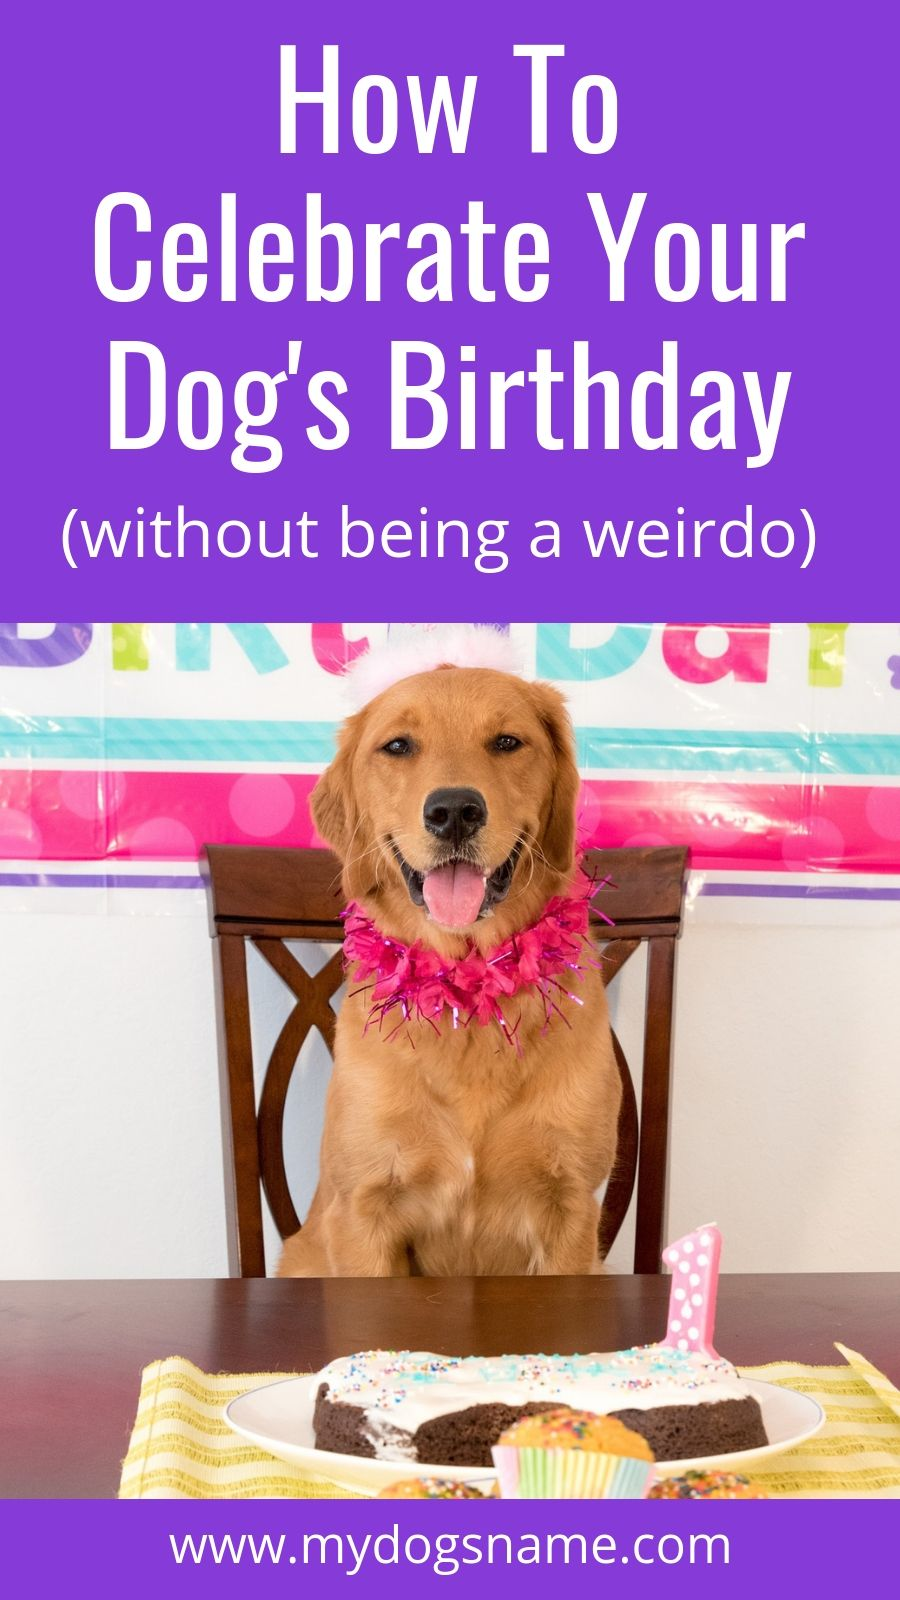 7 Fun Ways to Celebrate Your Dog's Birthday Dog birthday